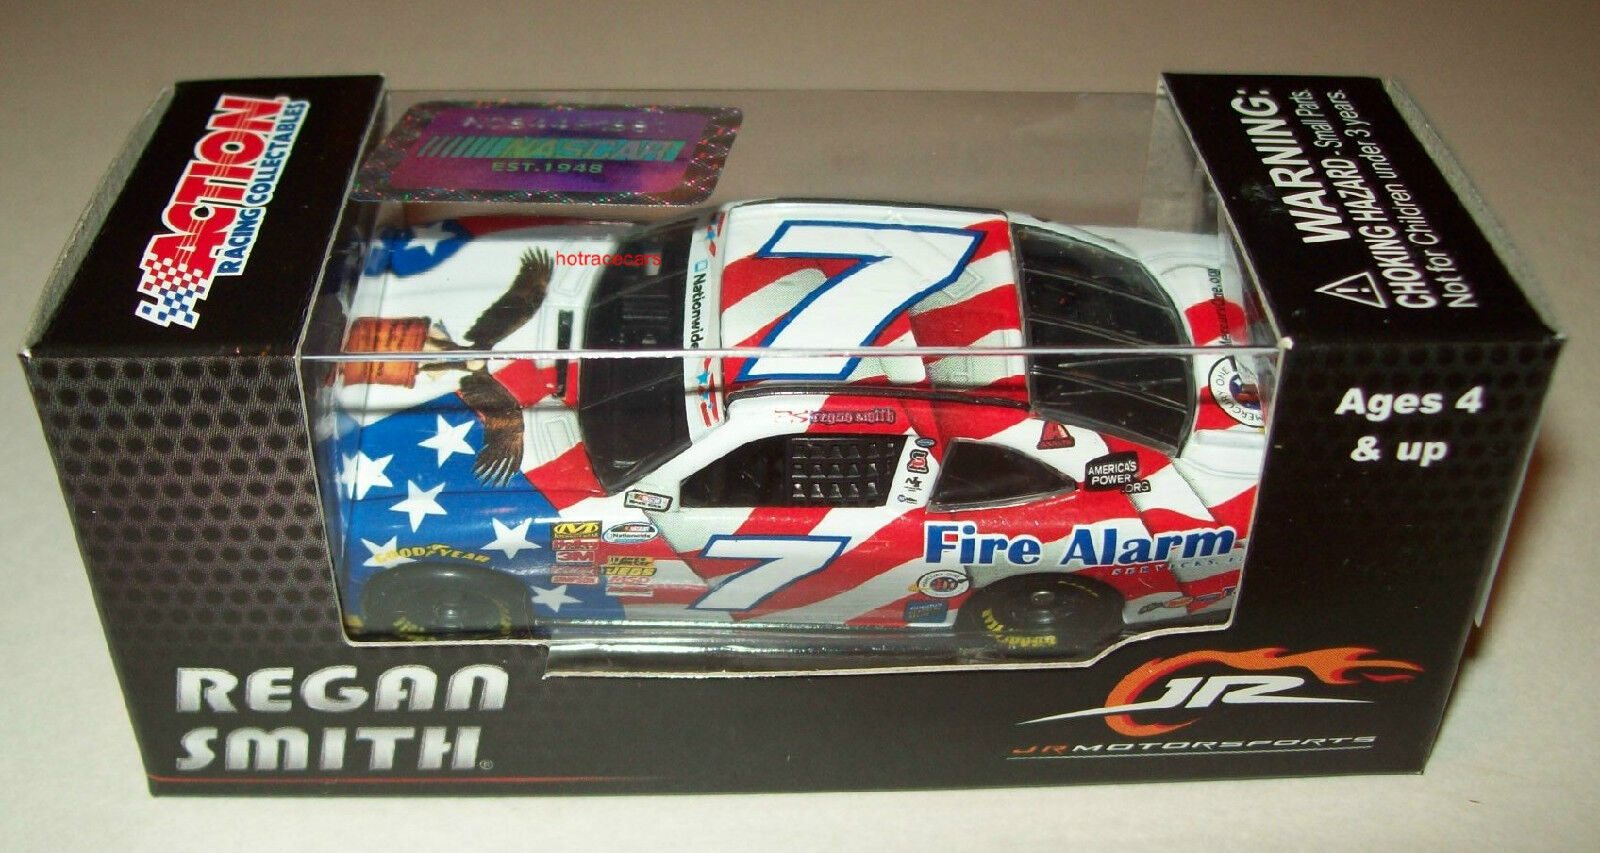 Regan Smith 2014 2014 2014 Fire Alarm Service Memorial Day Flag Nationwide Camaro 1 64 9fa6c1